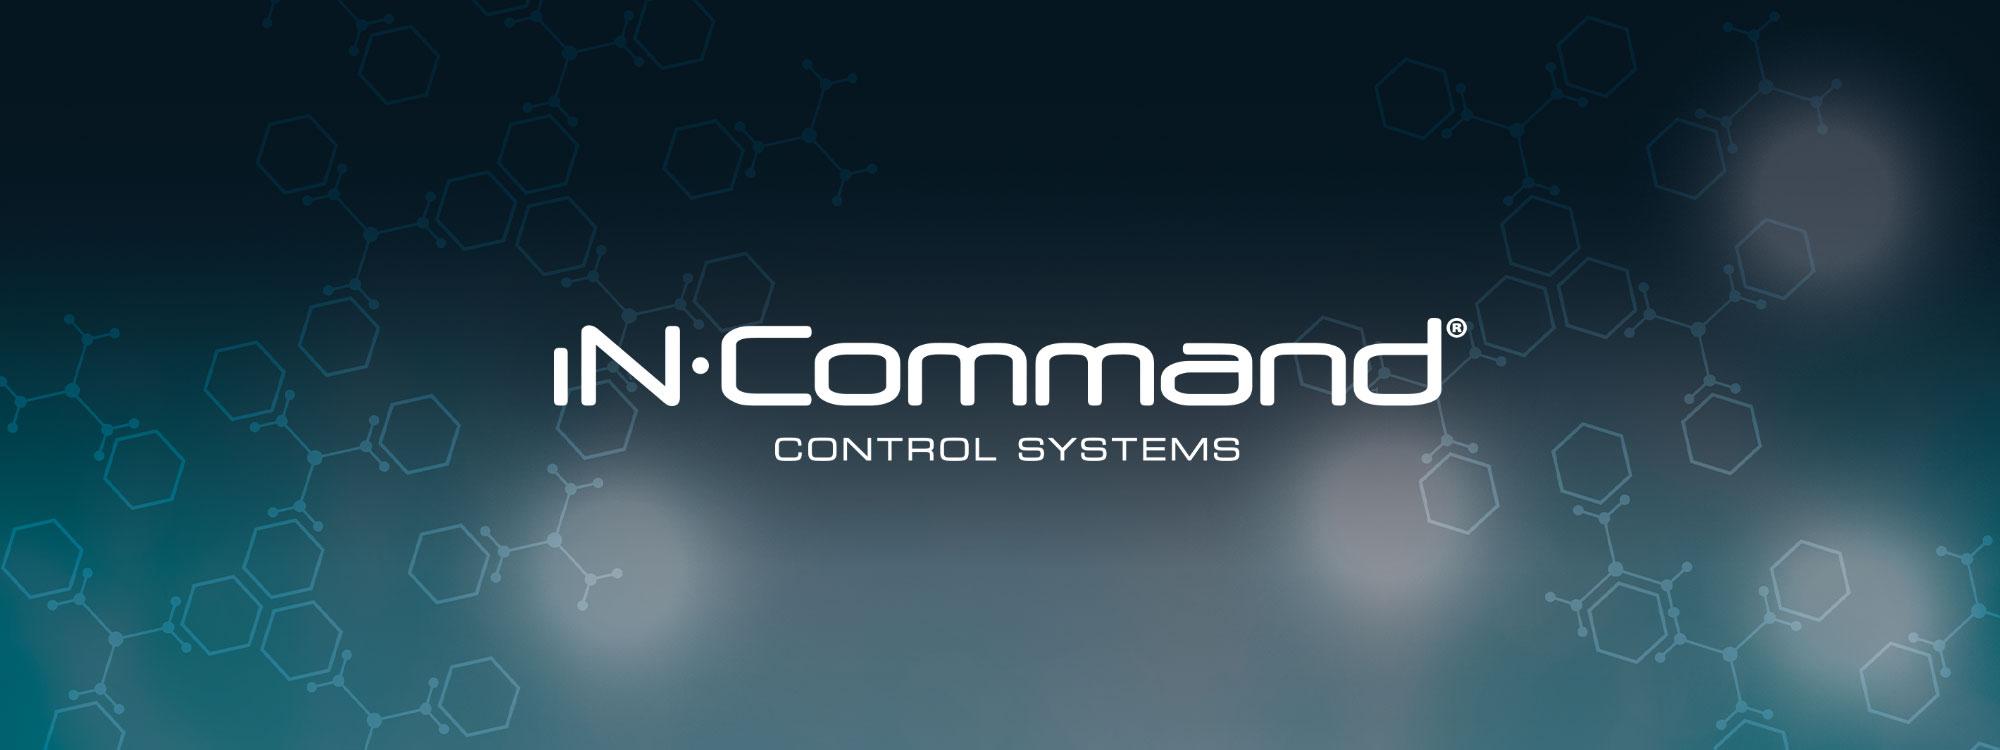 iN∙Command® App Update Brings More Alert Features